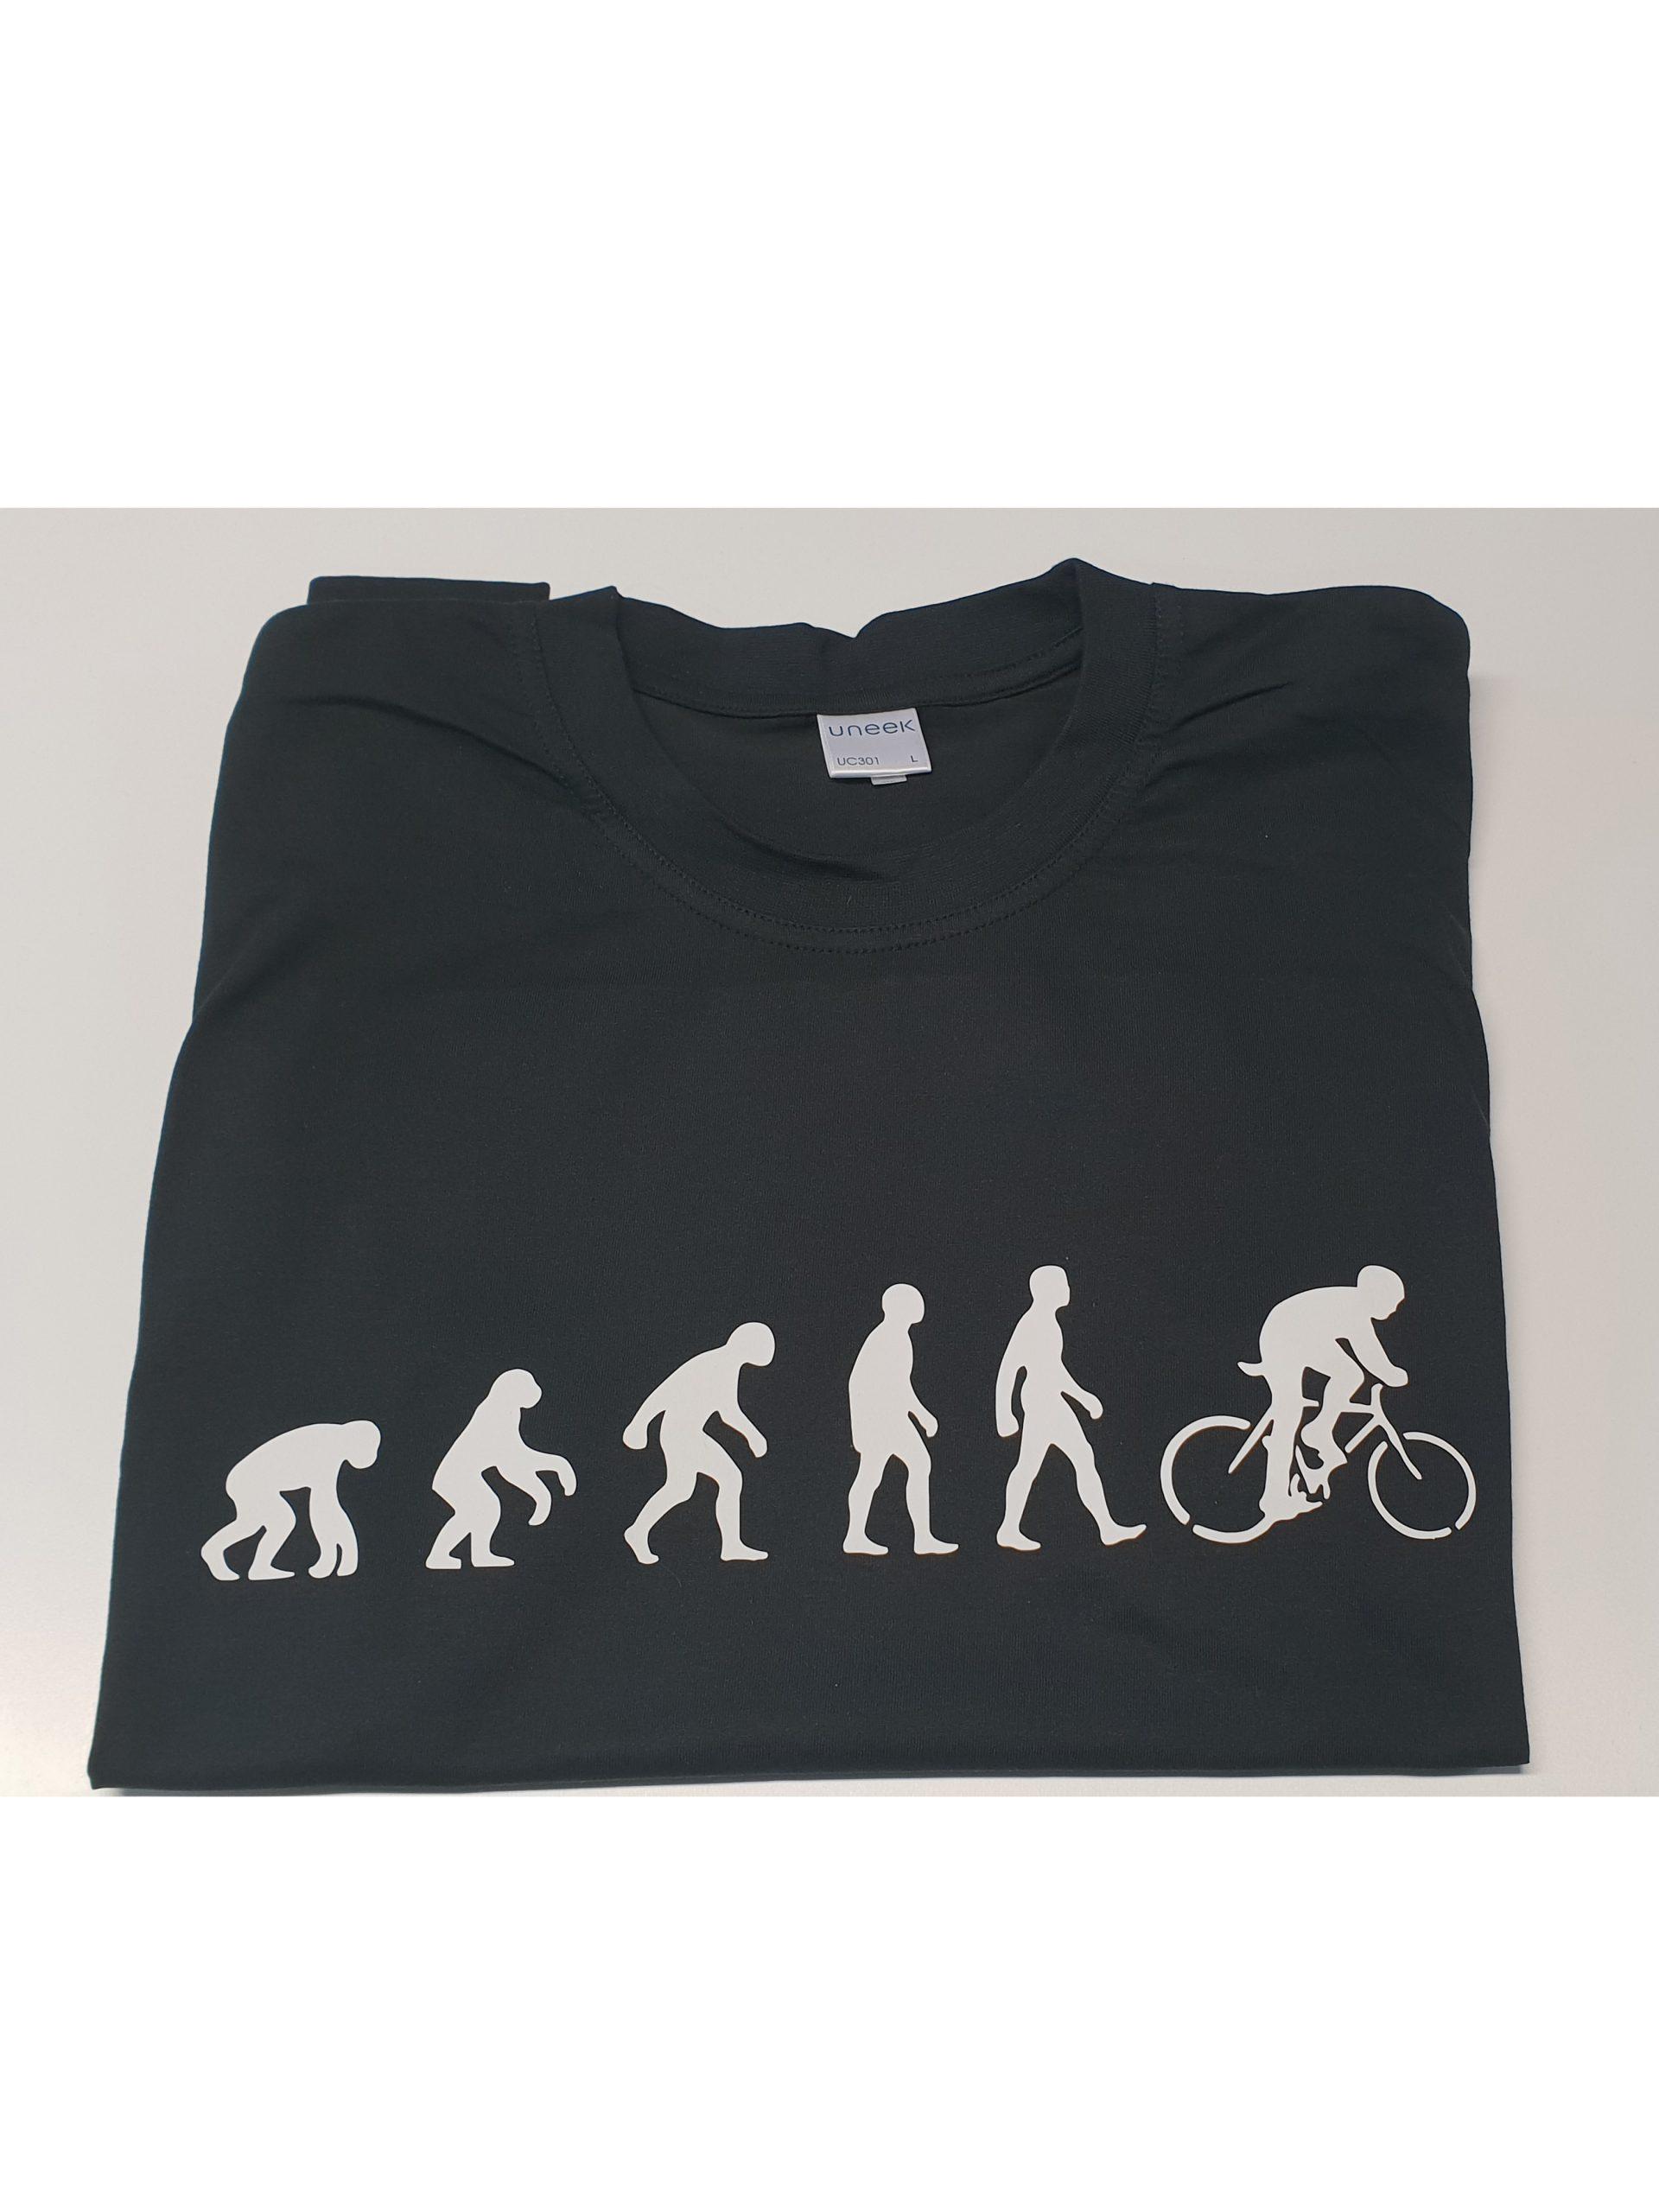 T Shirt Vinyl Example Small